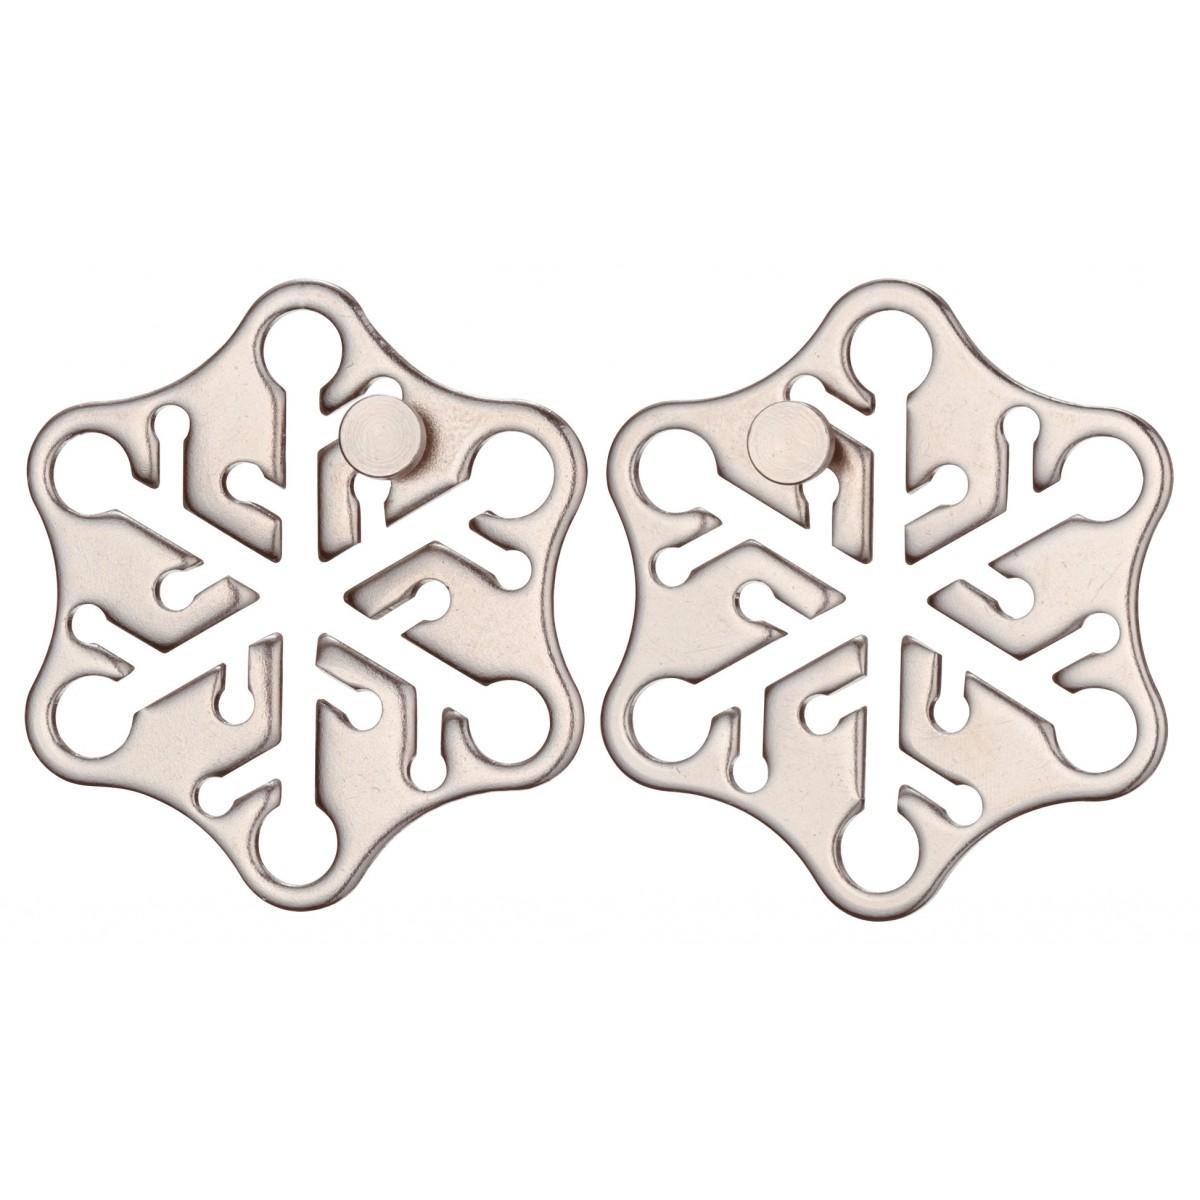 Puzzle mecanic - Huzzle Cast Snow | Logica Giochi - 2